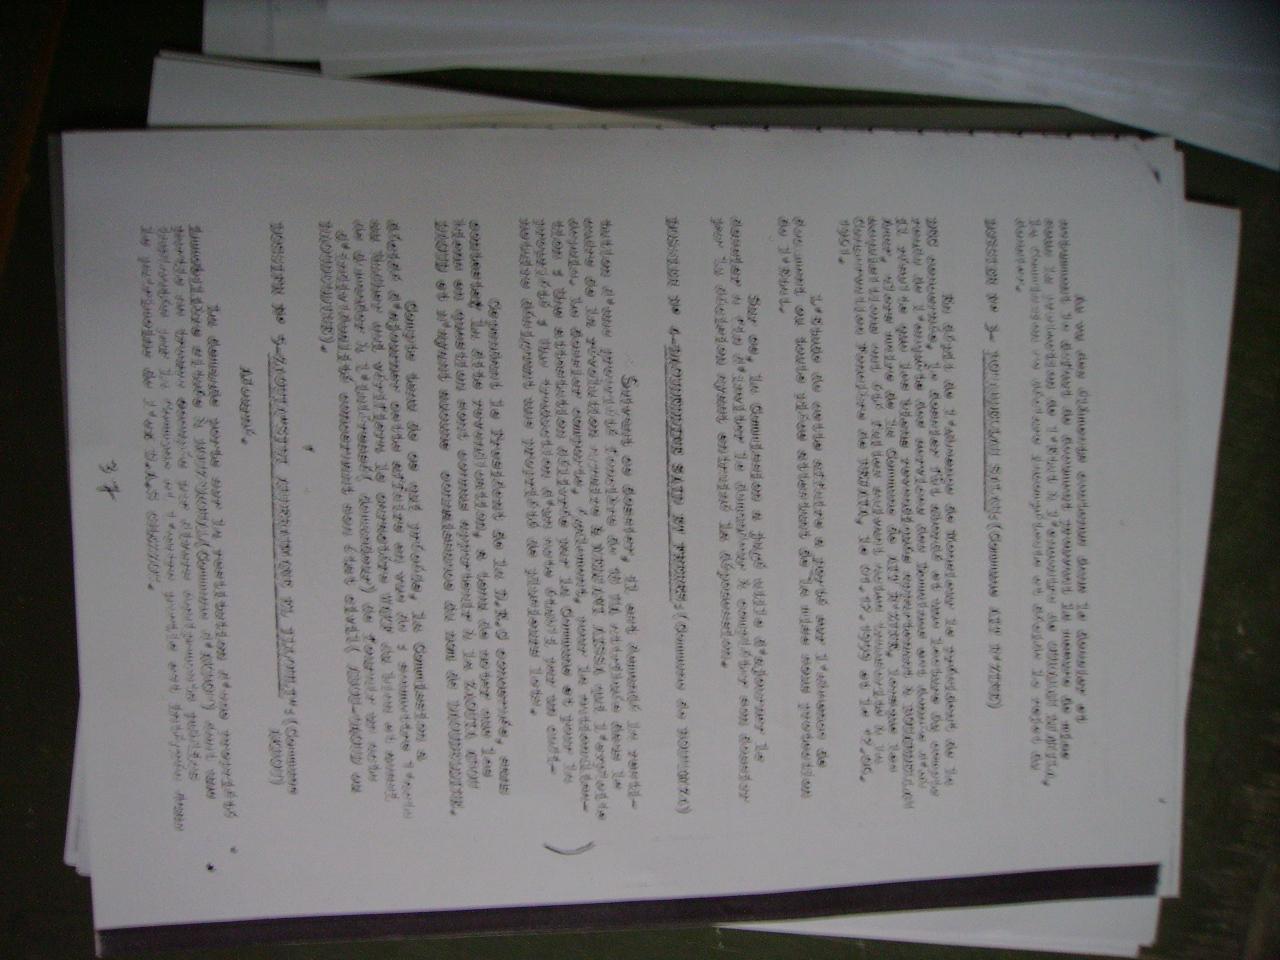 pvrunioncommissionrestitution10mai1997p4.jpg